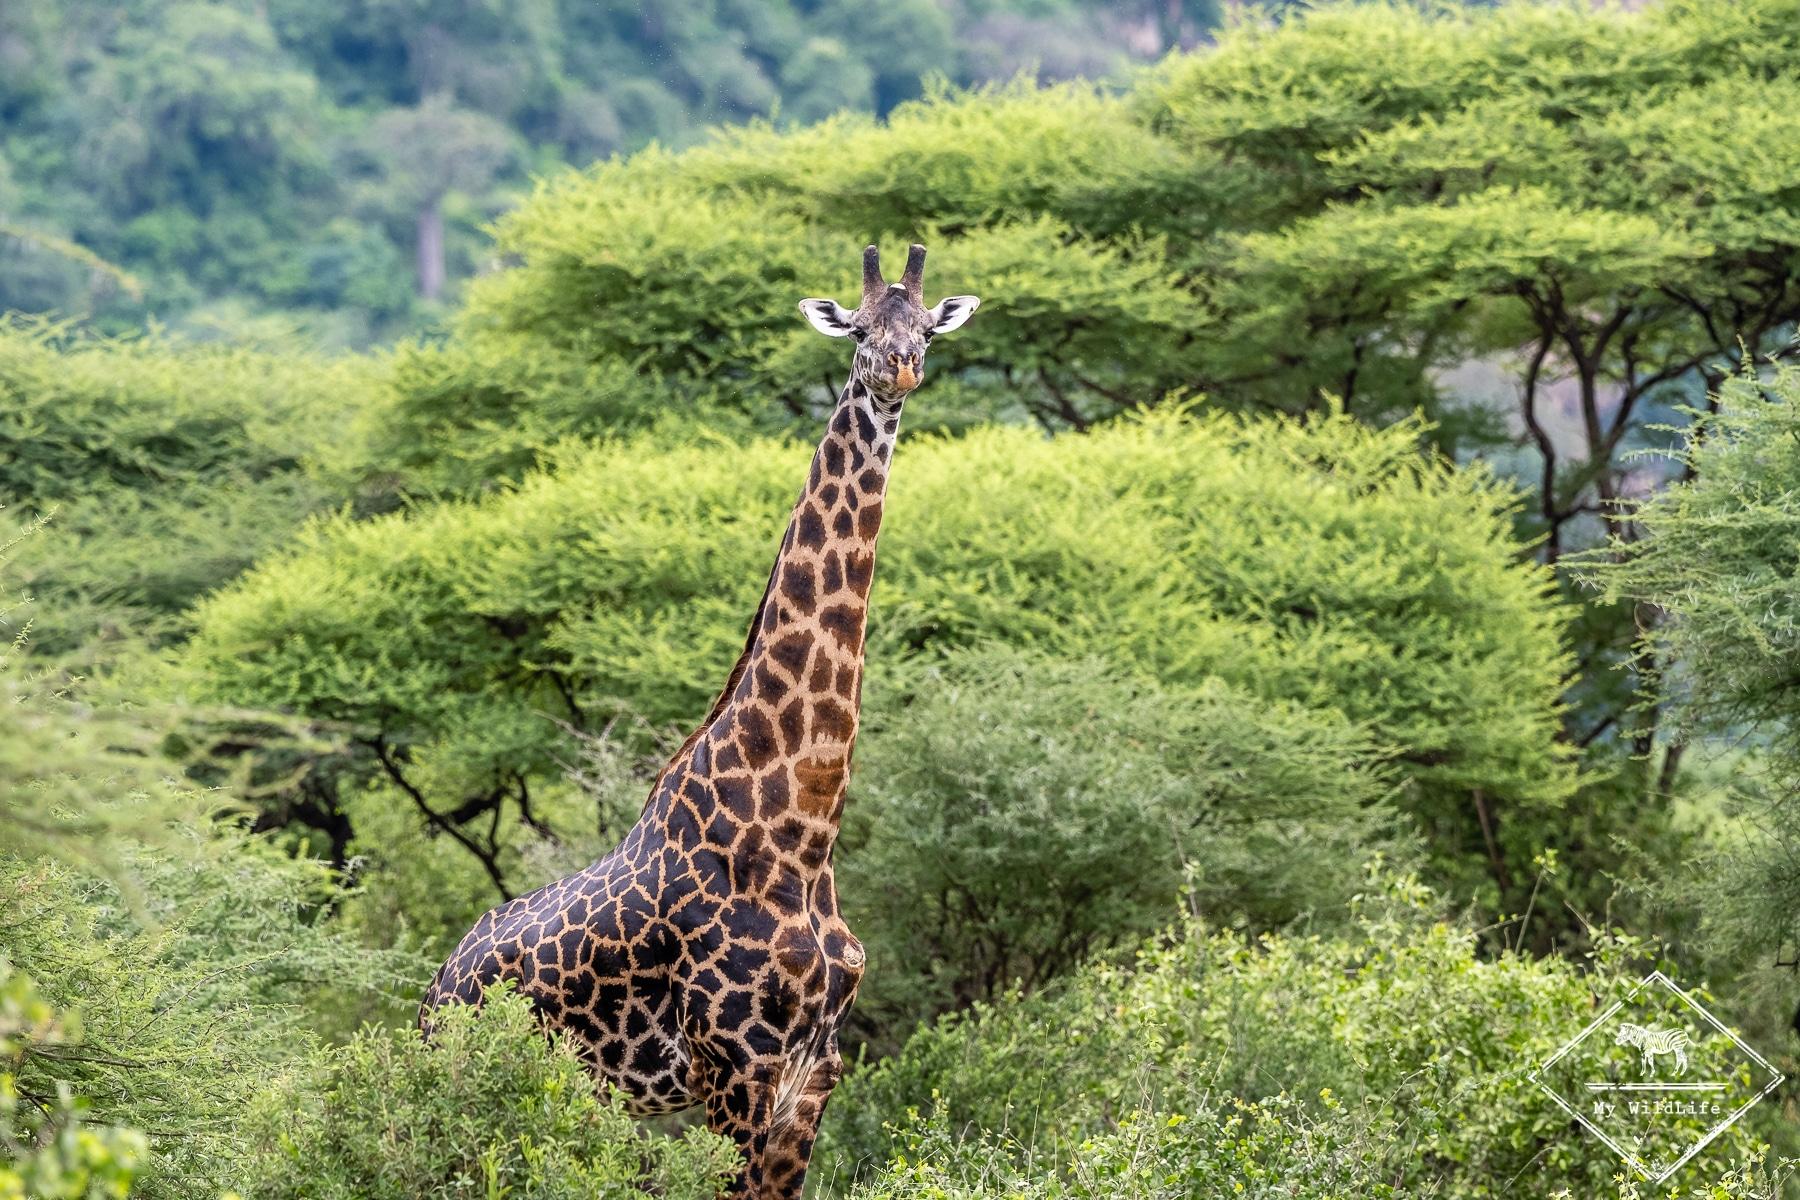 tanzanie-lac-manyara@GregoryRohart-4477